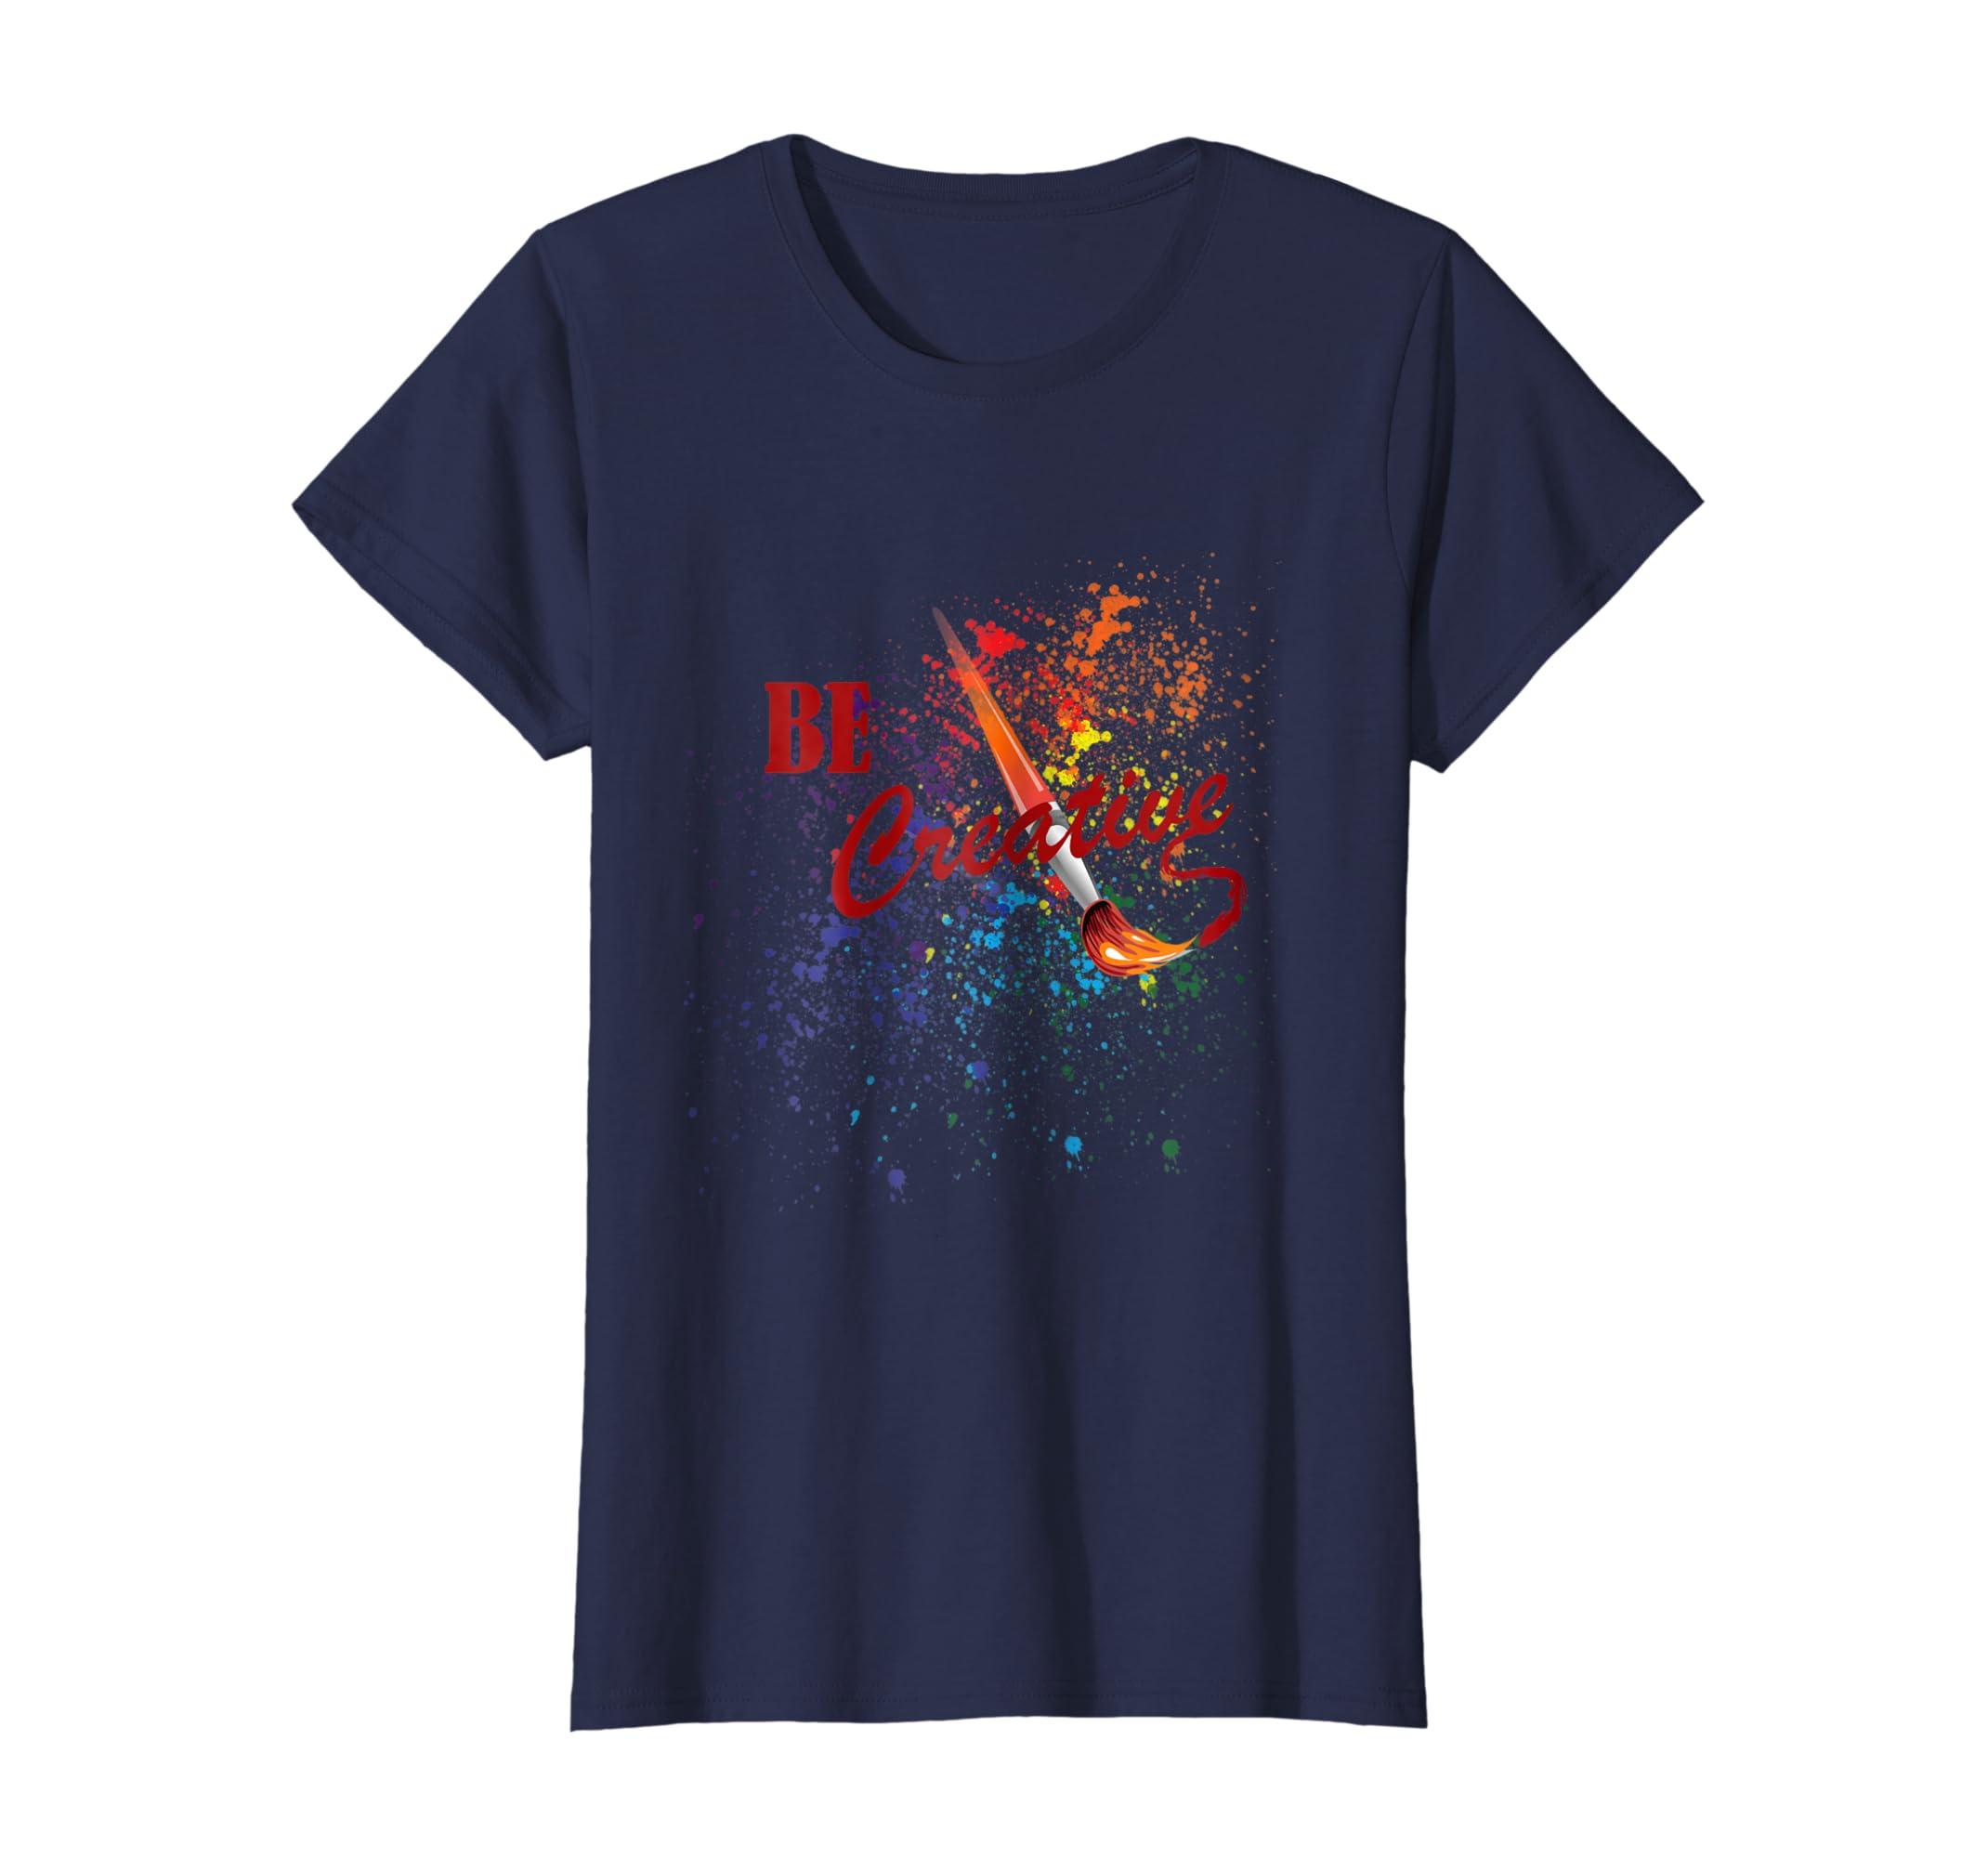 57cbc03ea Amazon.com: Be Creative, Designer and Artist T-Shirt: Clothing